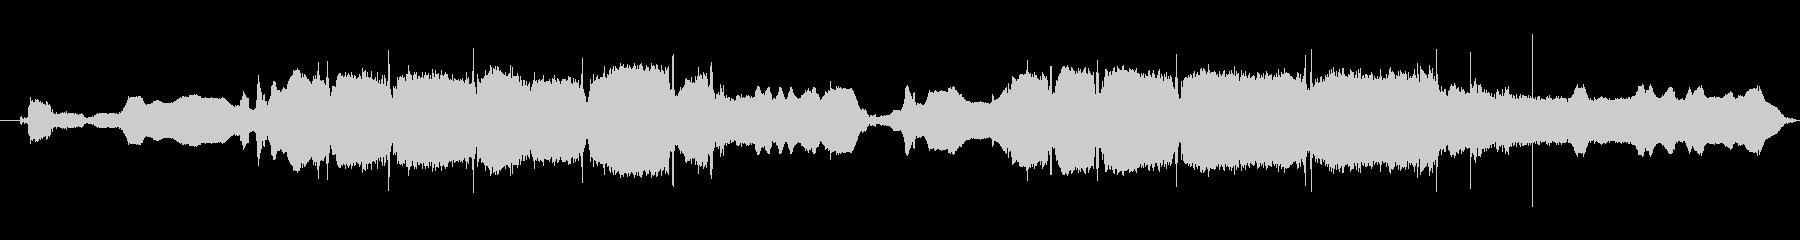 Miataオンボード-エンジン、ス...の未再生の波形